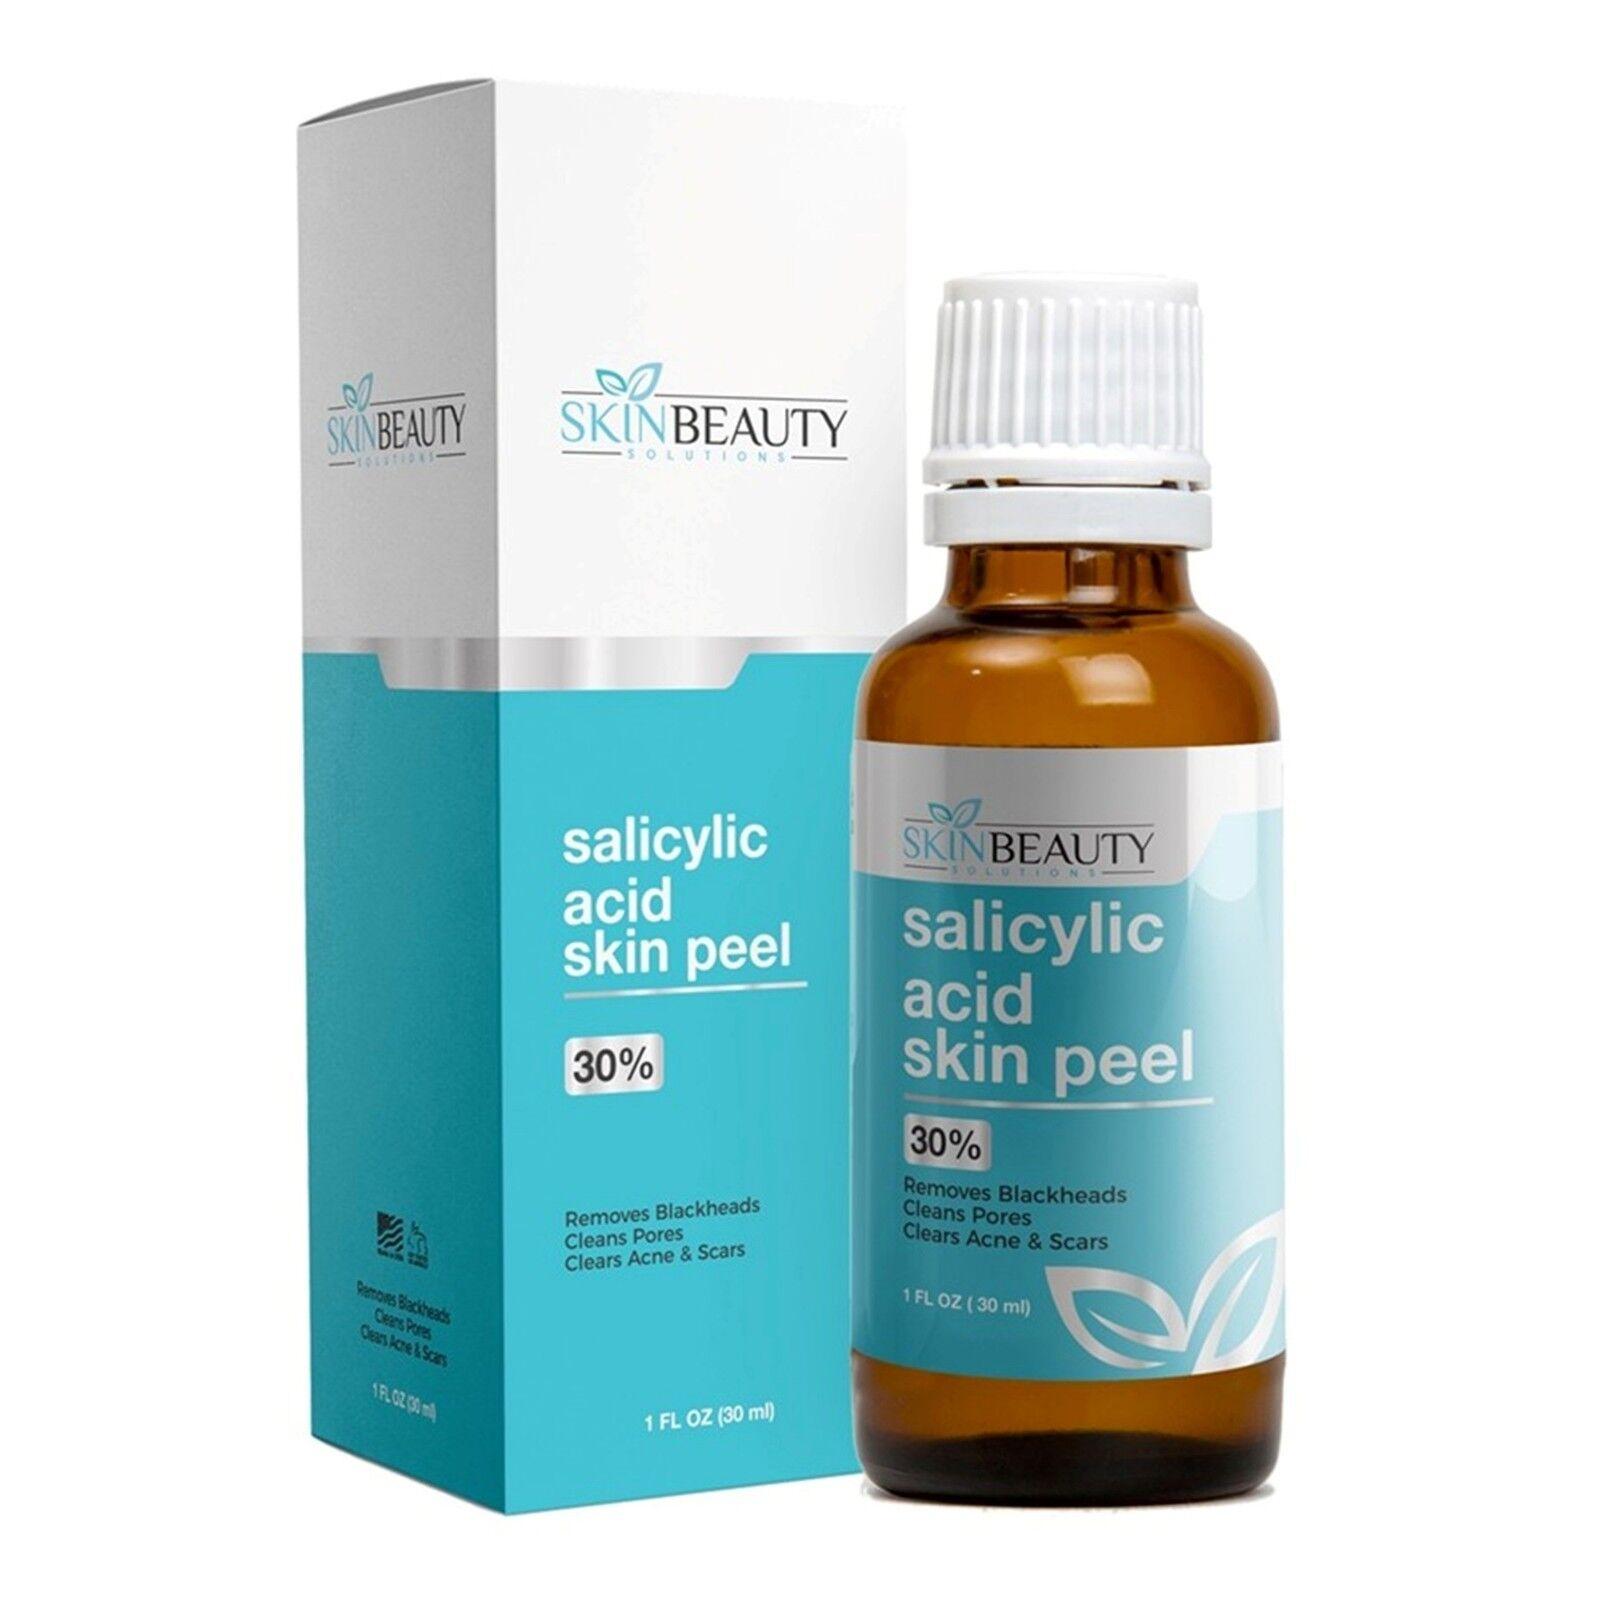 SALICYLIC ACID Skin Cosmetic Peel -Acne Wrinkles Dull Clogge